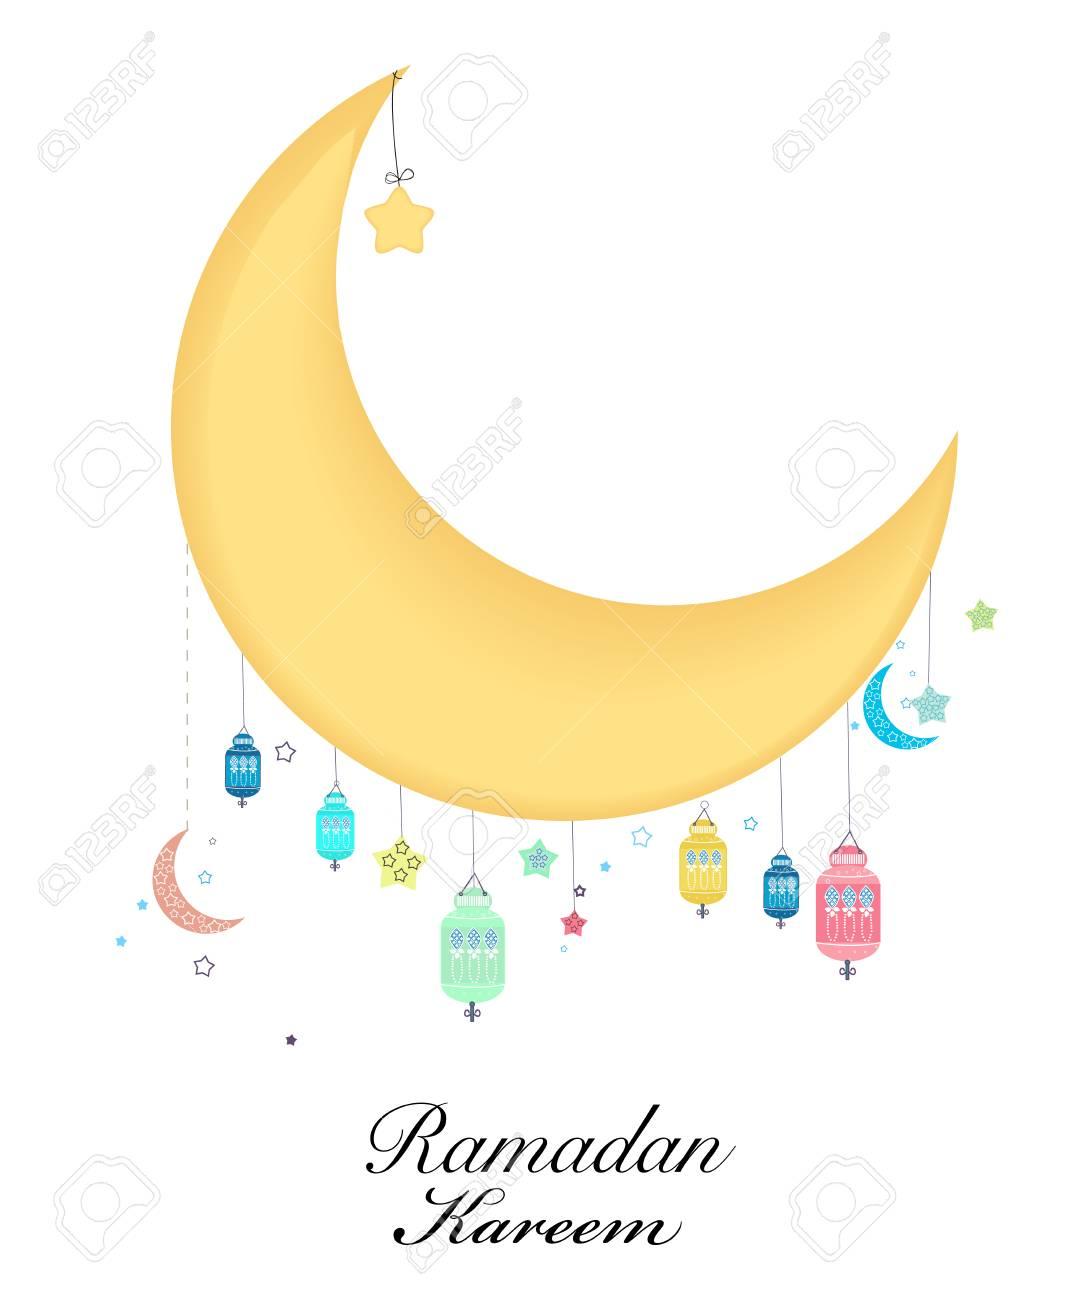 Ramadan kareem with moon and star ramadan night traditional ramadan kareem with moon and star ramadan night traditional lantern of ramadan greeting card stock m4hsunfo